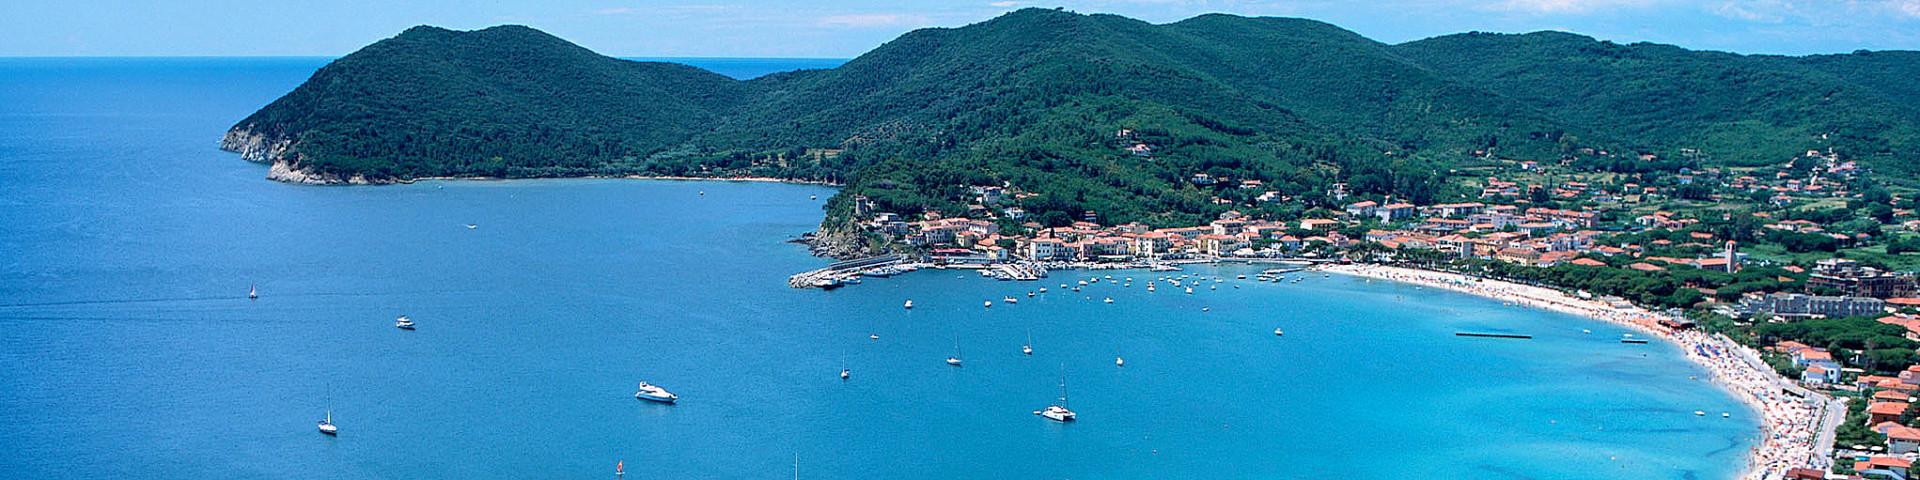 Elba, Marina di Campo, celkový pohled na záliv